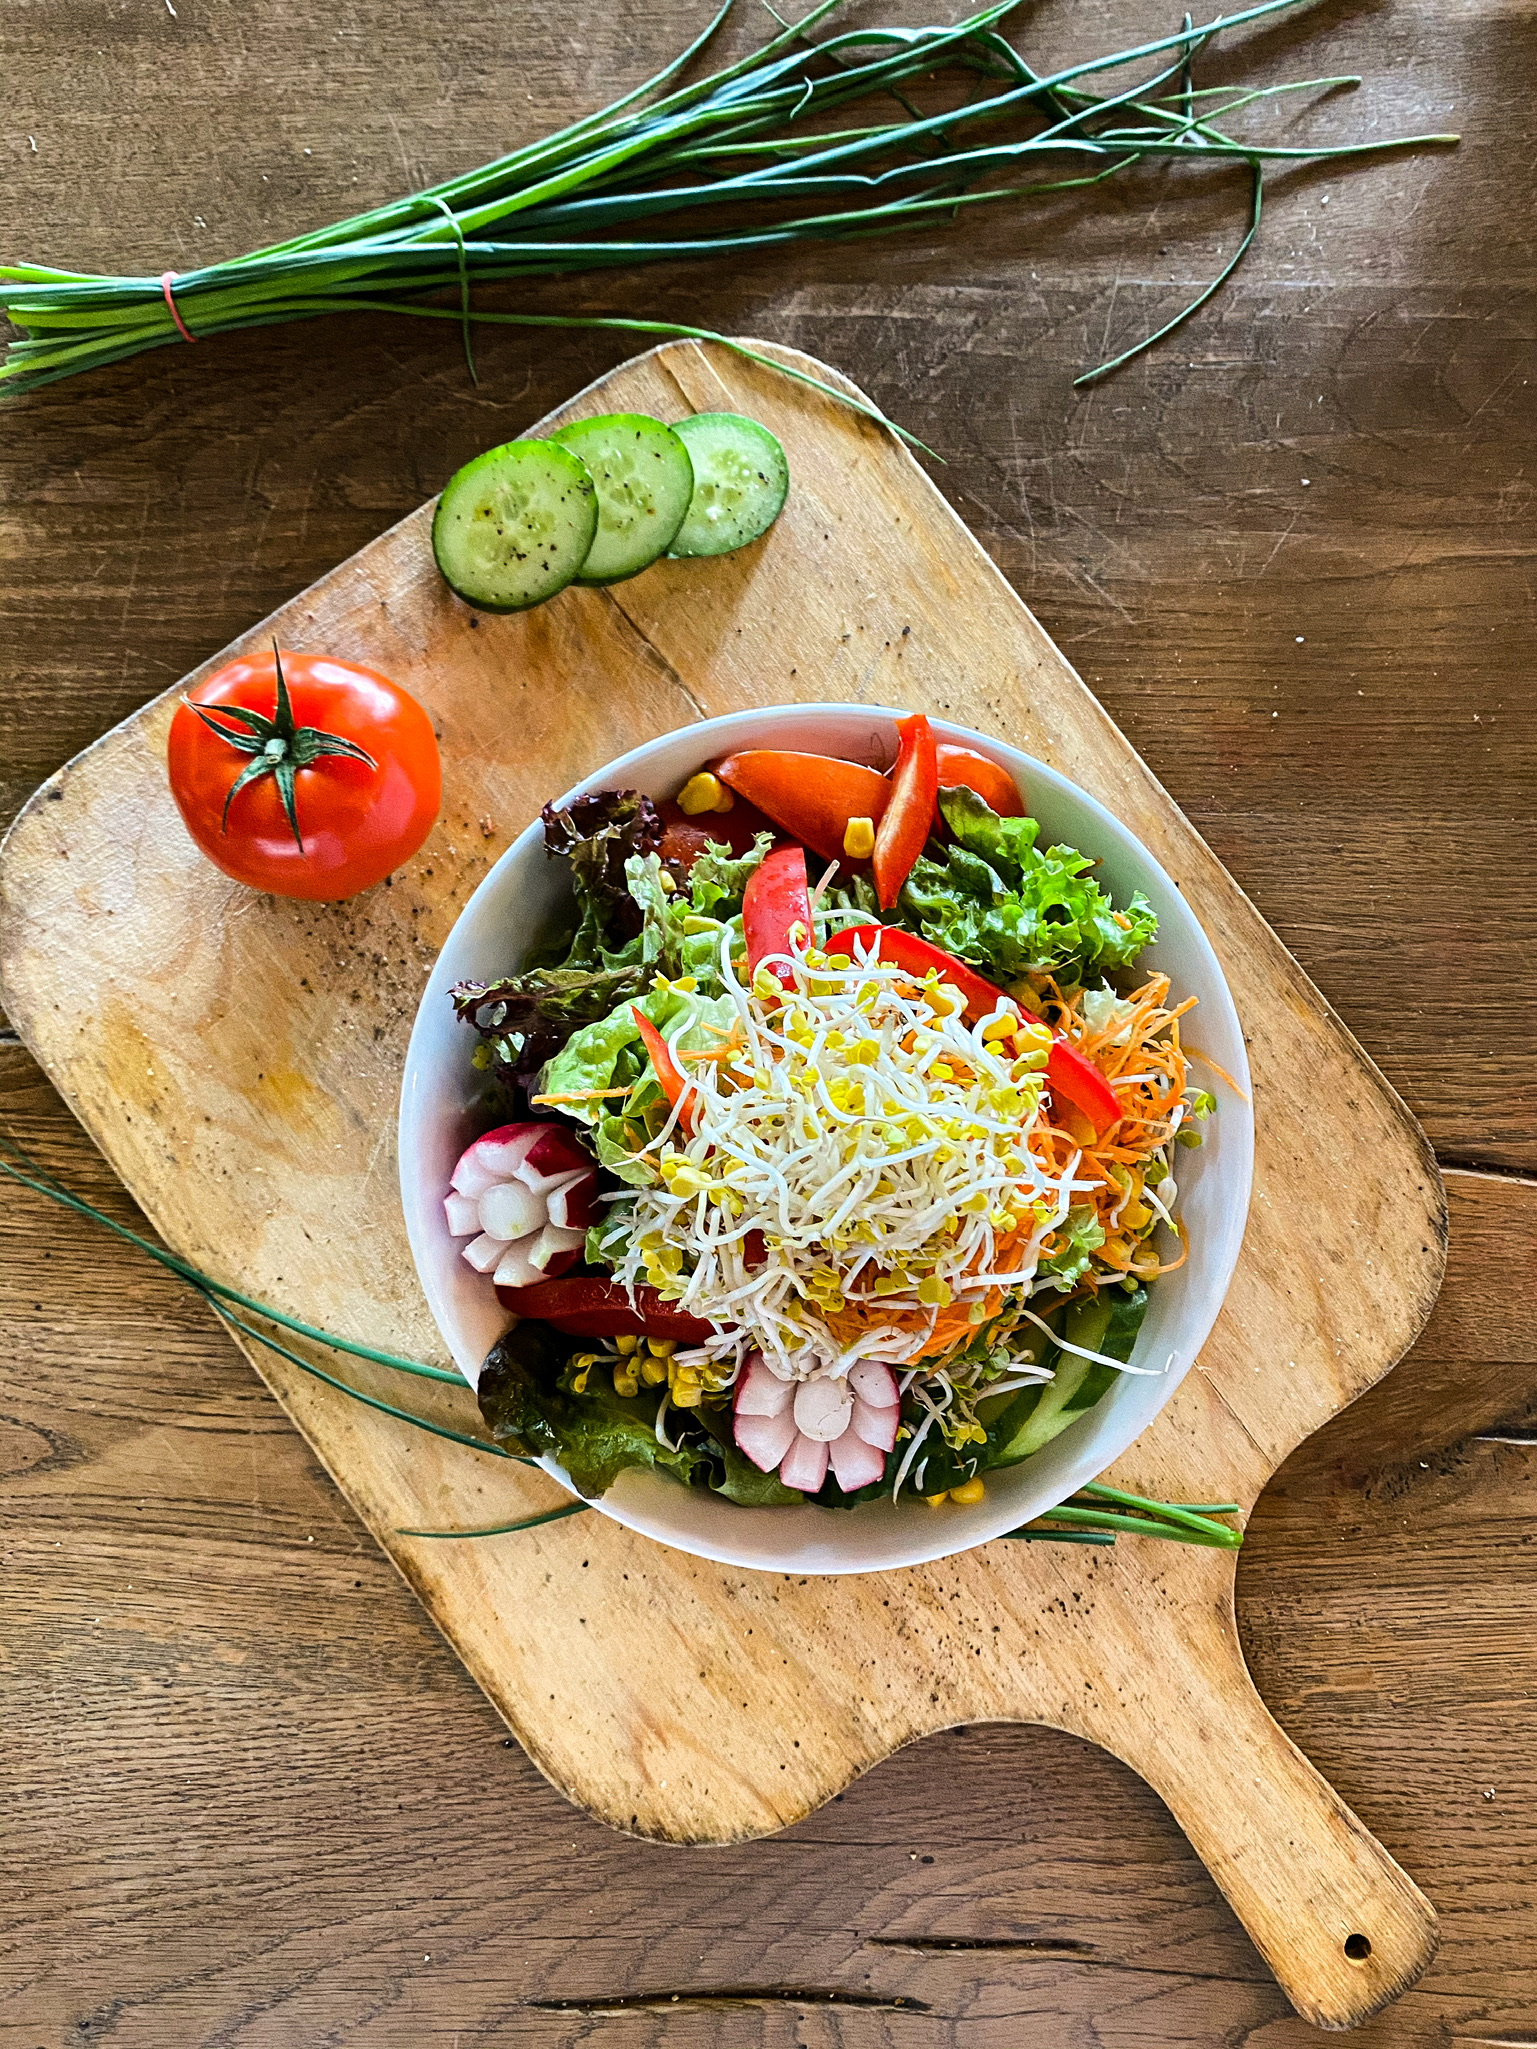 großer gemischter Salatteller